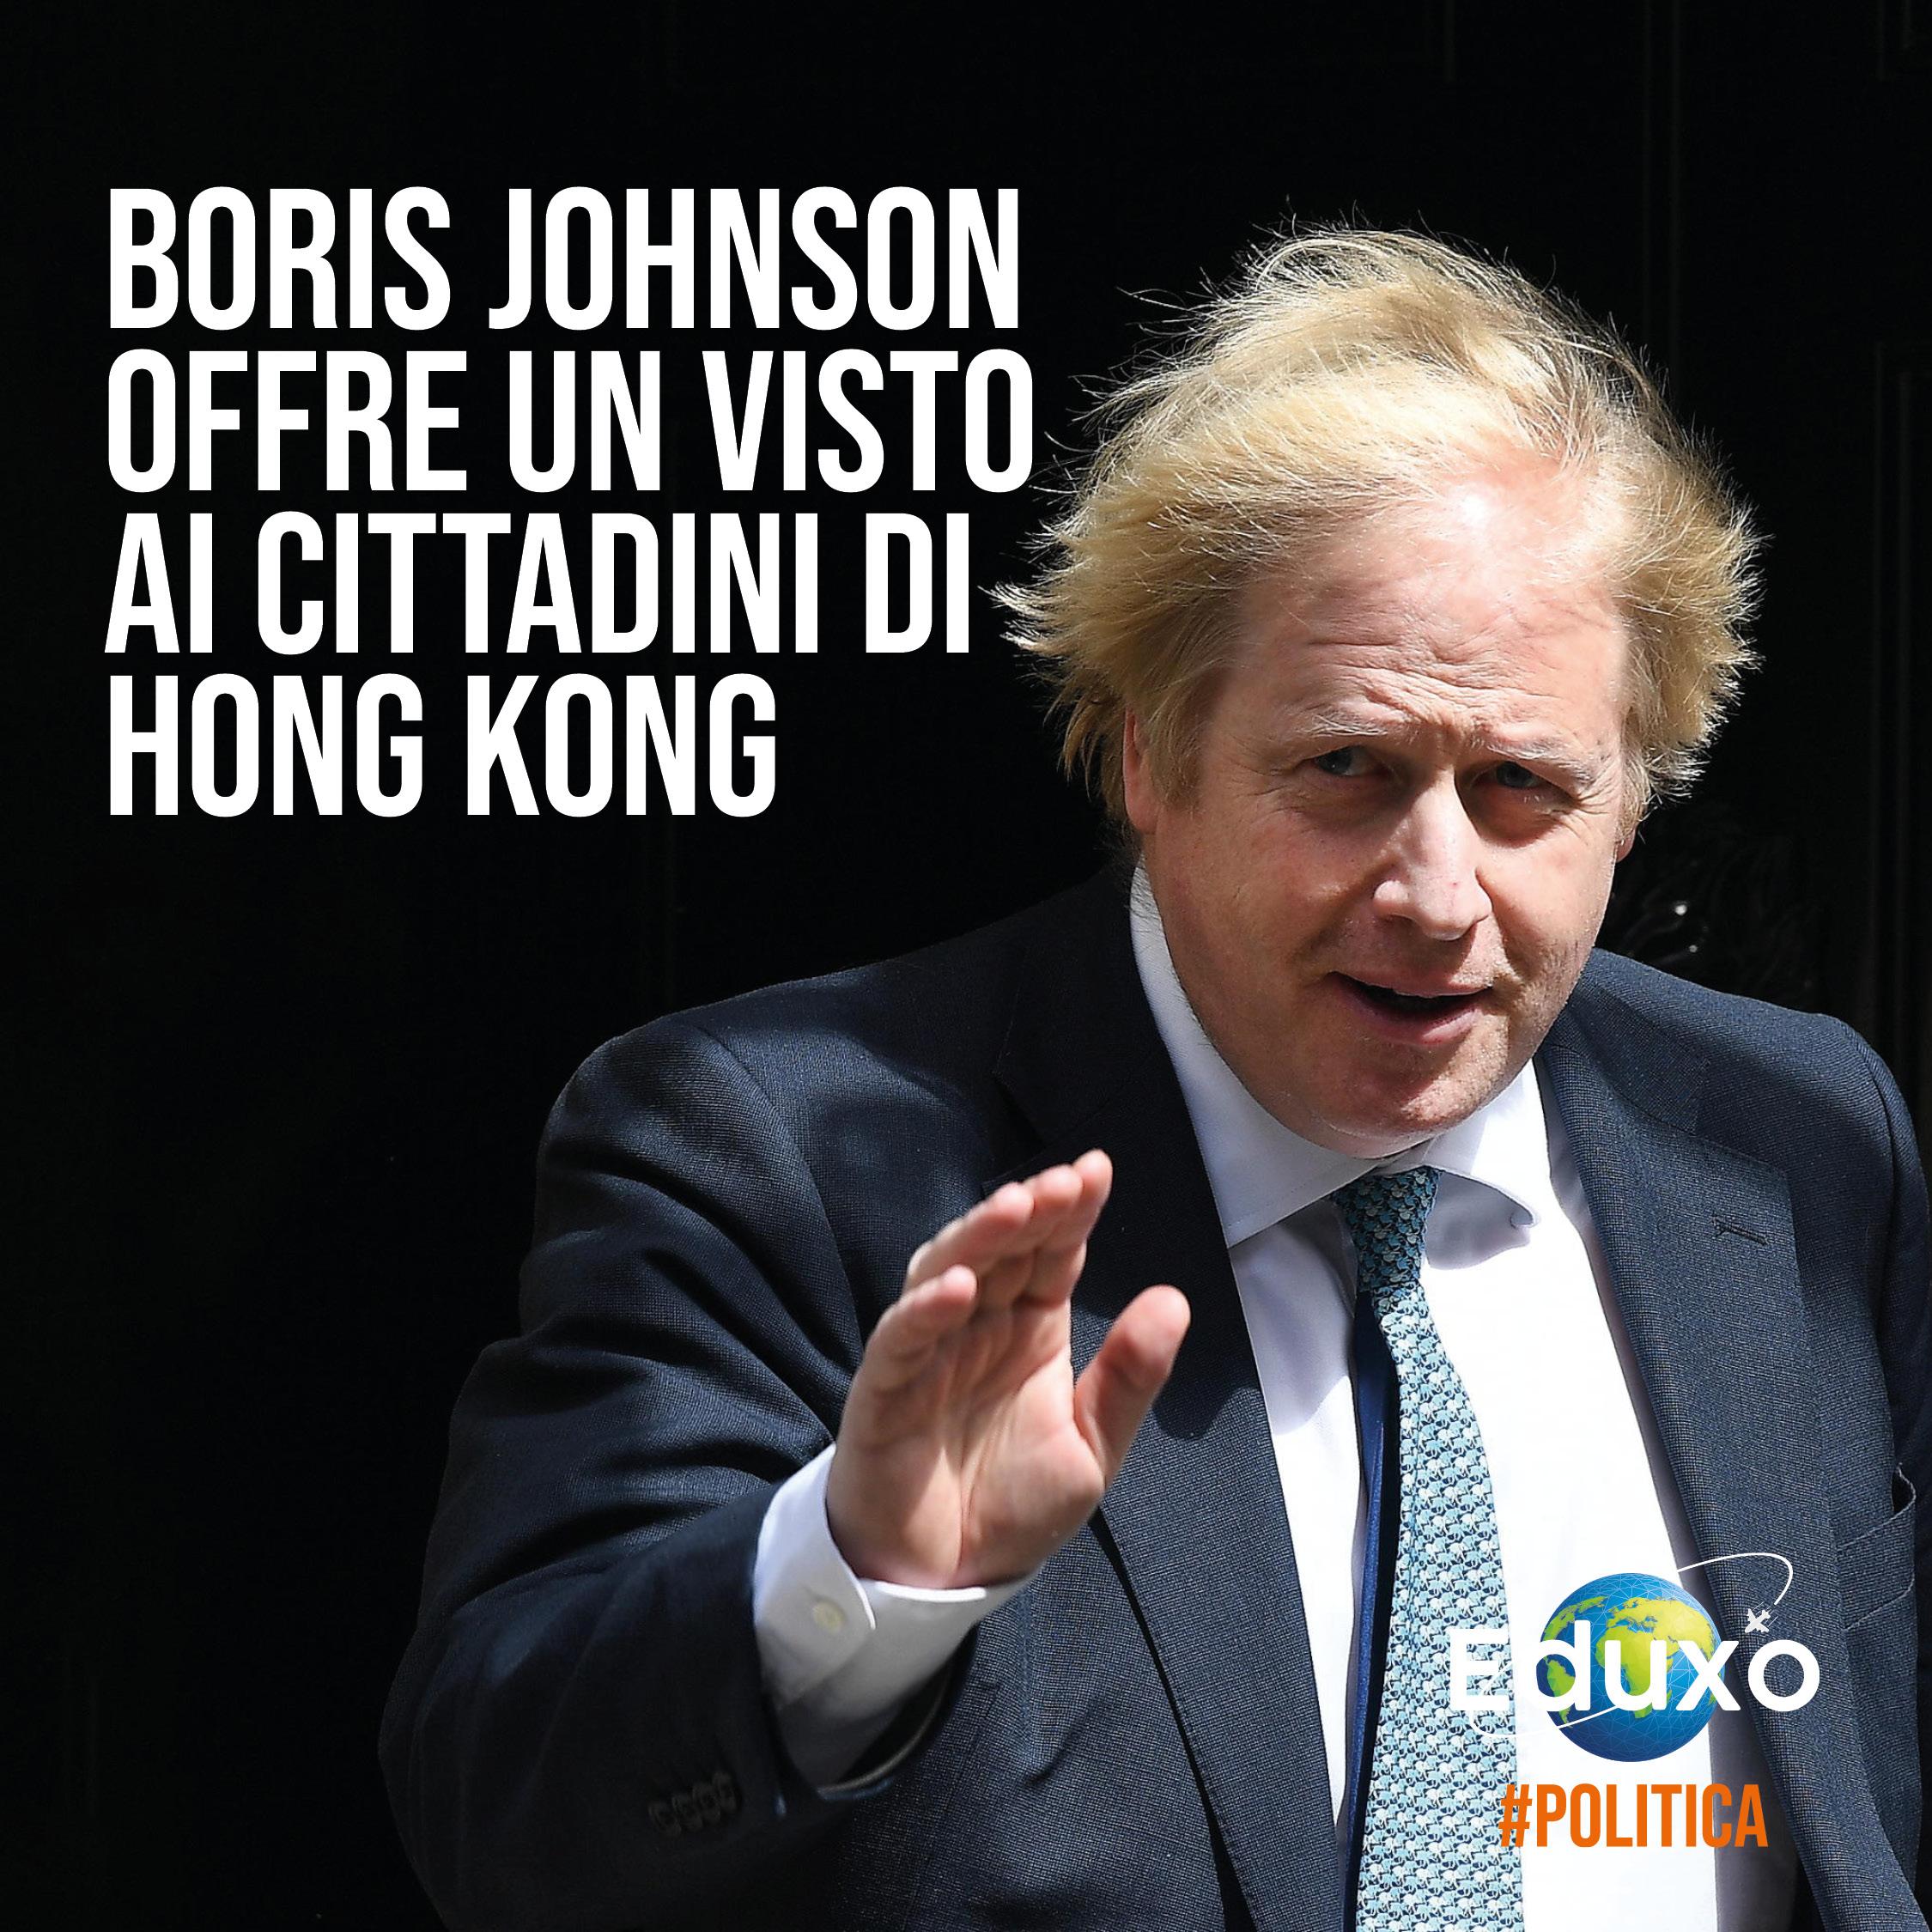 You are currently viewing Boris Johnson offre un Visto ai cittadini di Hong Kong